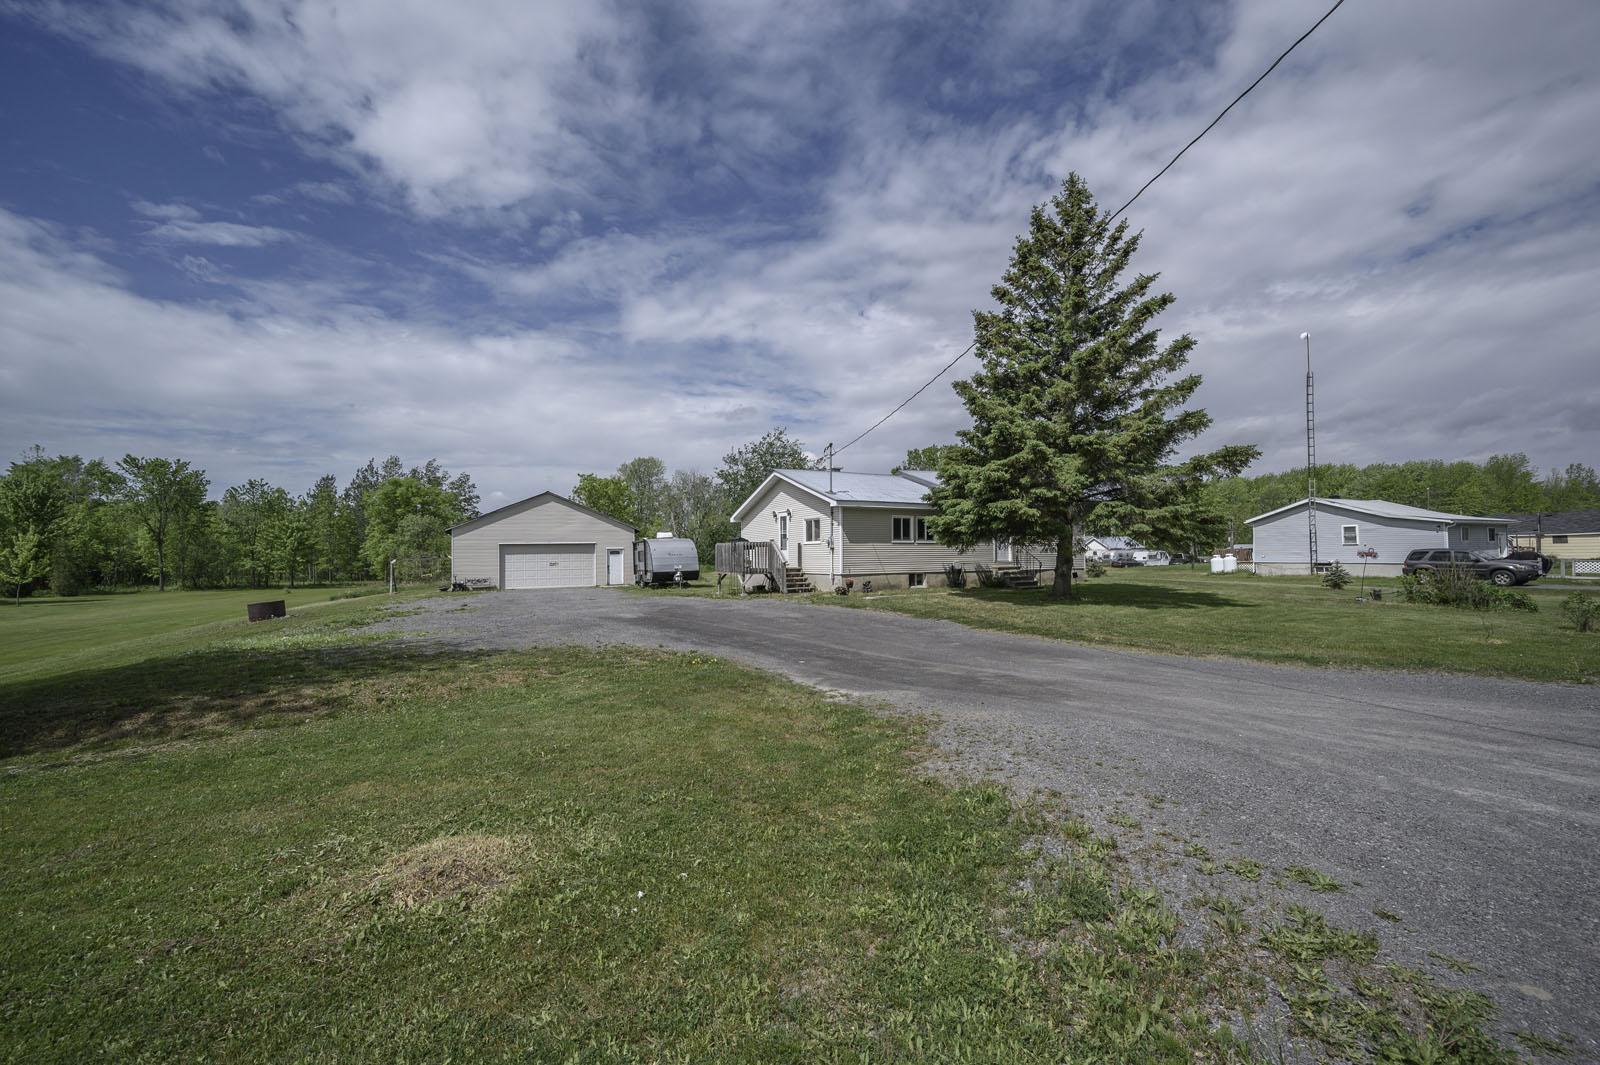 5016 Robertson Rd. MORRISBURG, ON